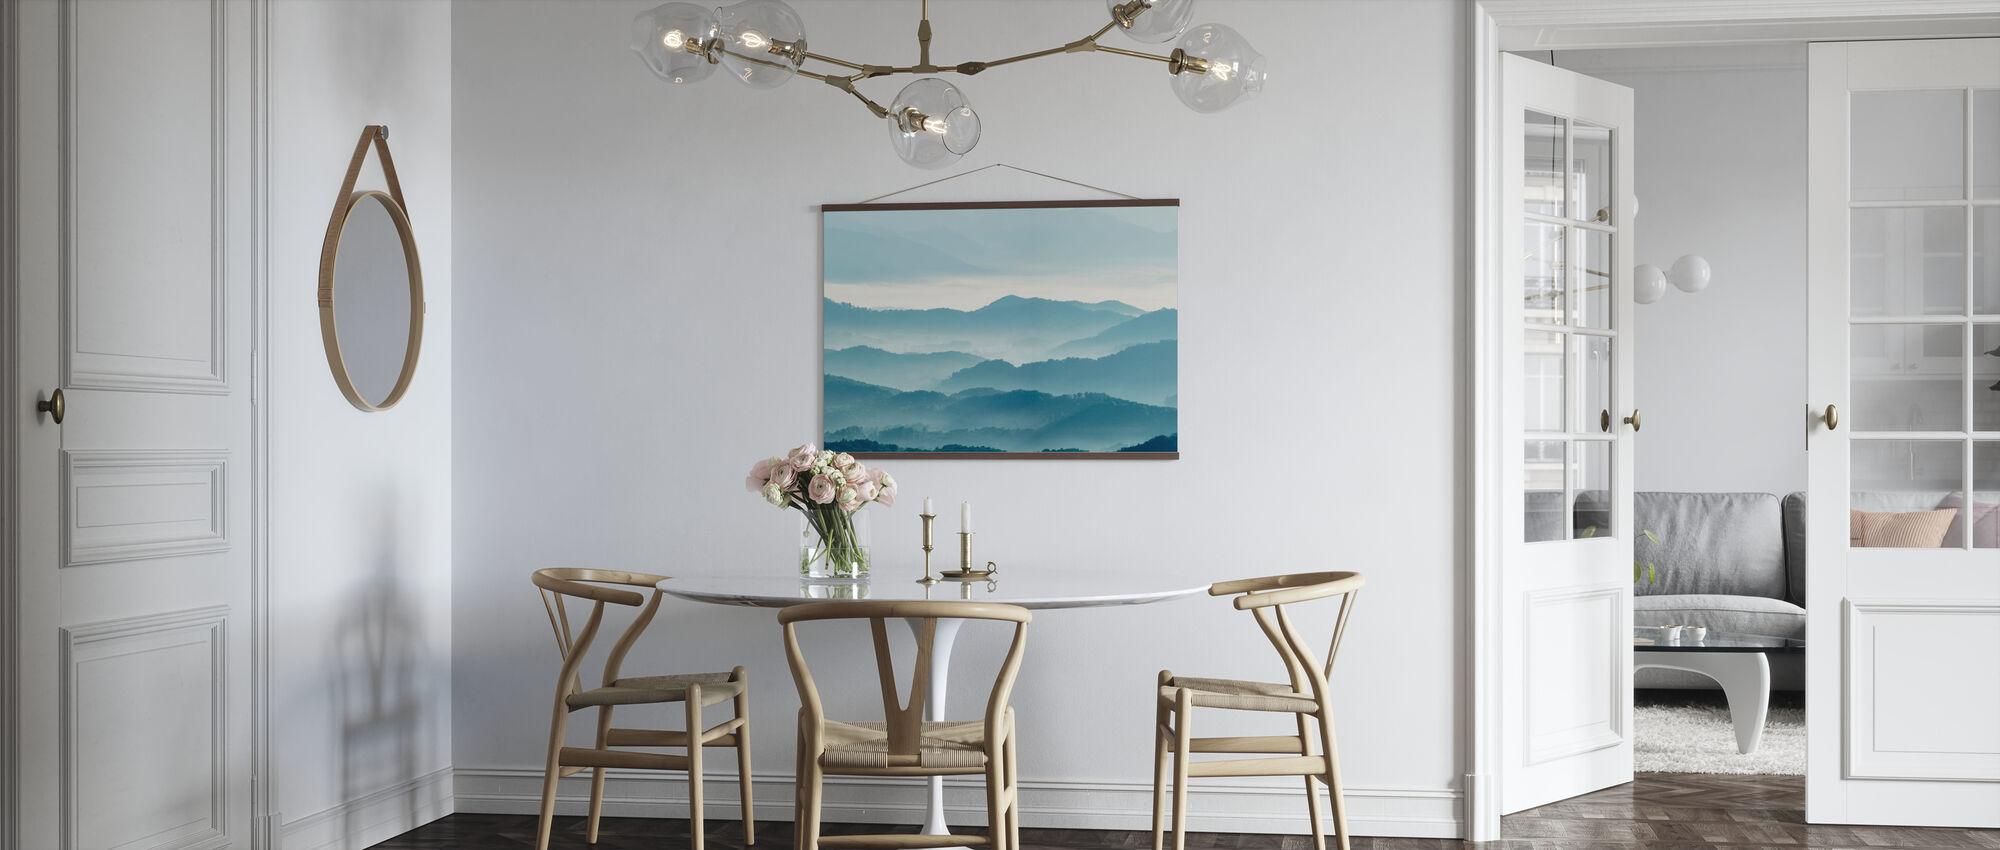 Misty Mountains - Poster - Kitchen